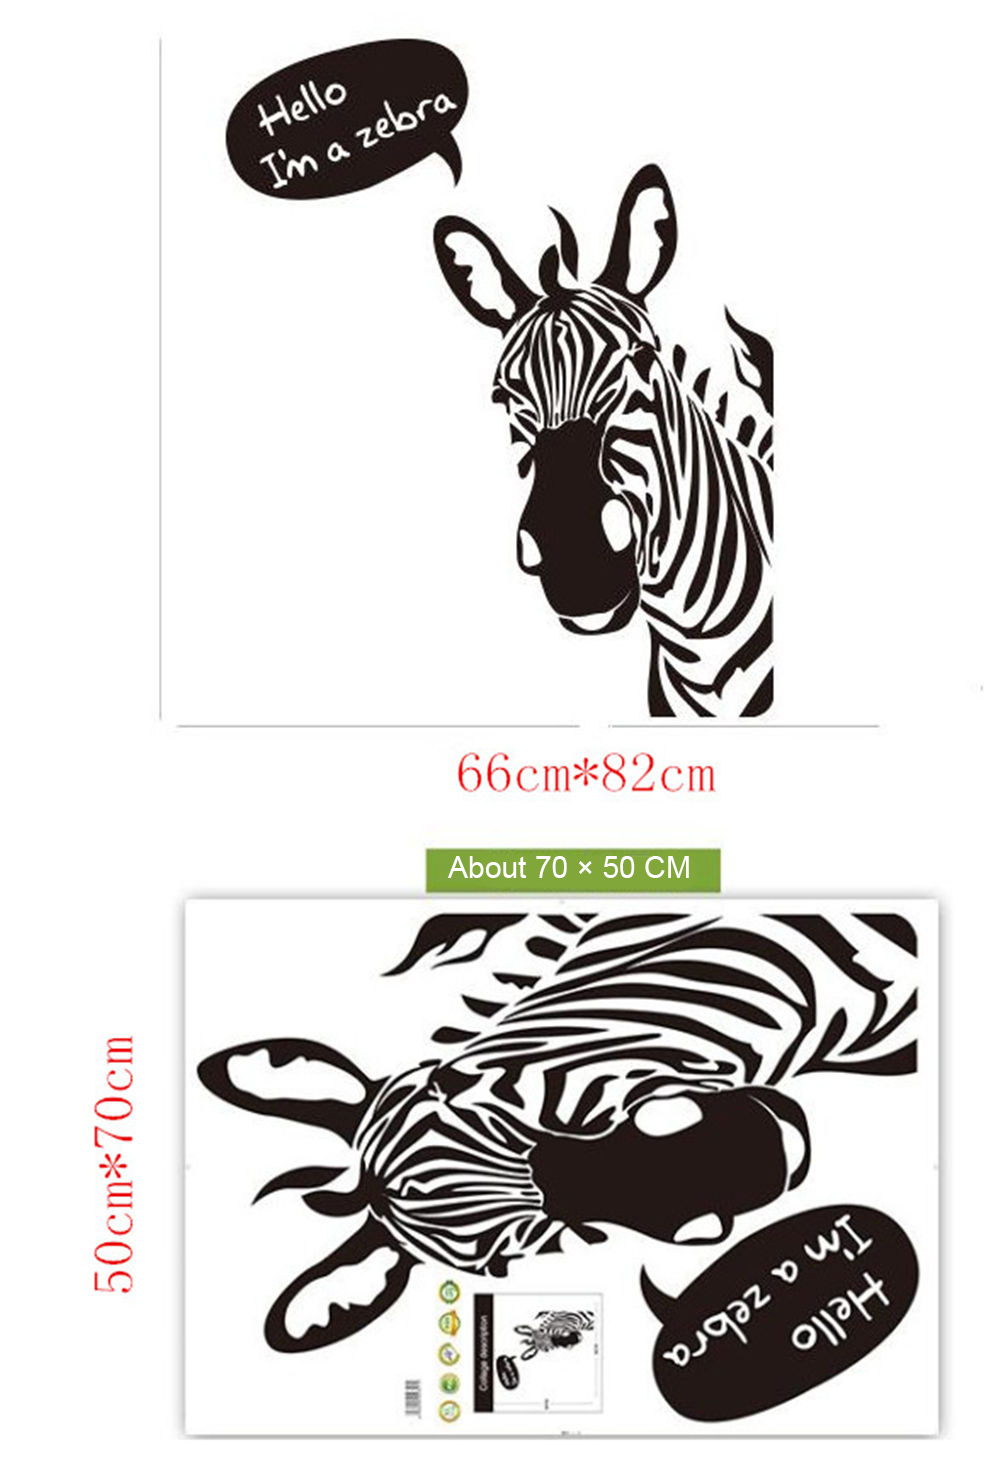 decorative stickers animal decor modern removable decal modern decor wall sticker art vinyl deco tree bird 2 in